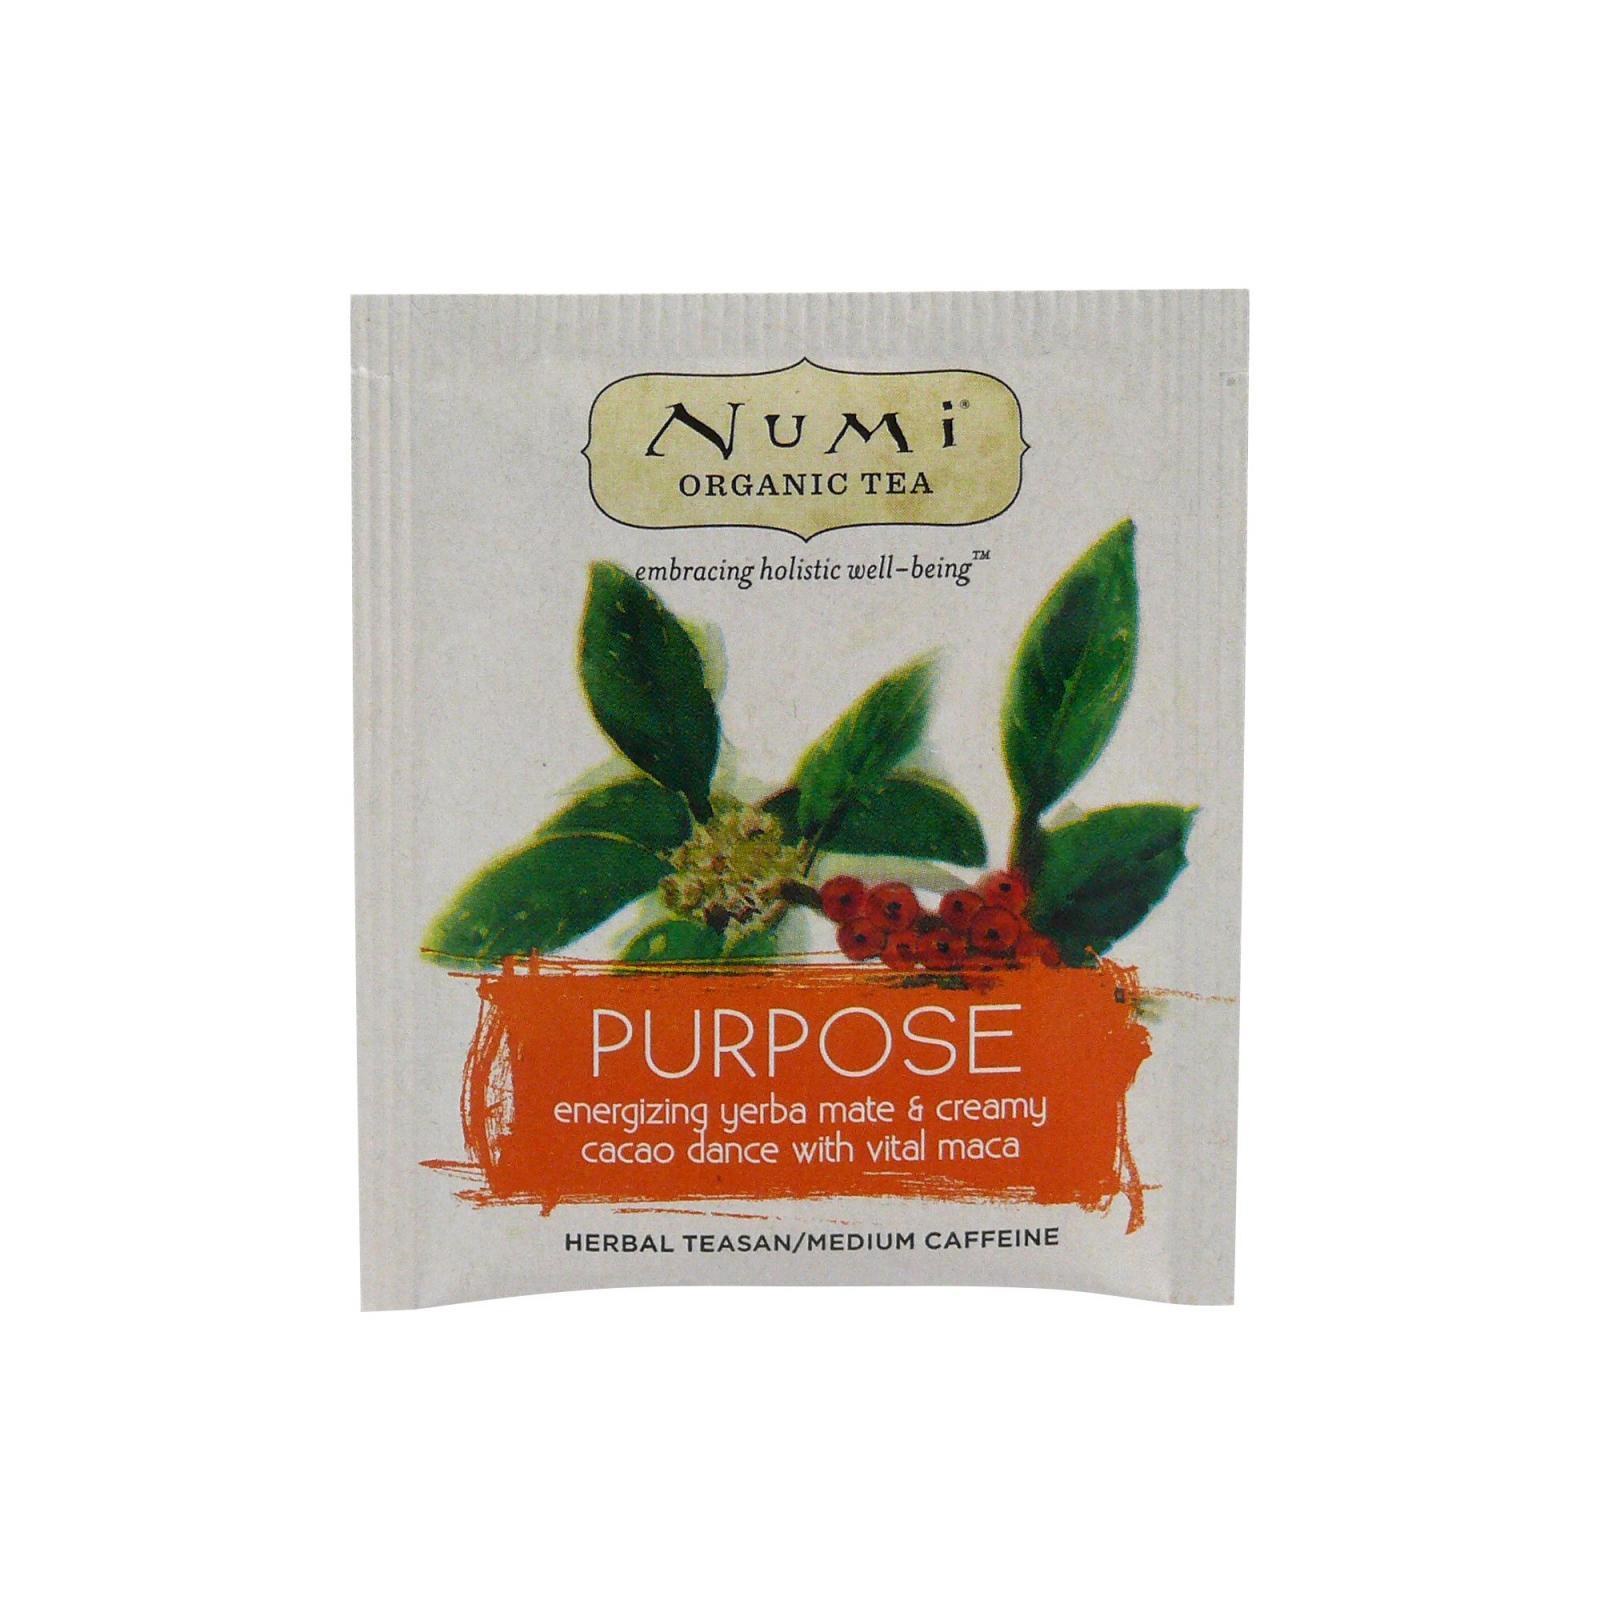 Numi Organic Tea Bylinný čaj Purpose 2,5 g, 1 ks